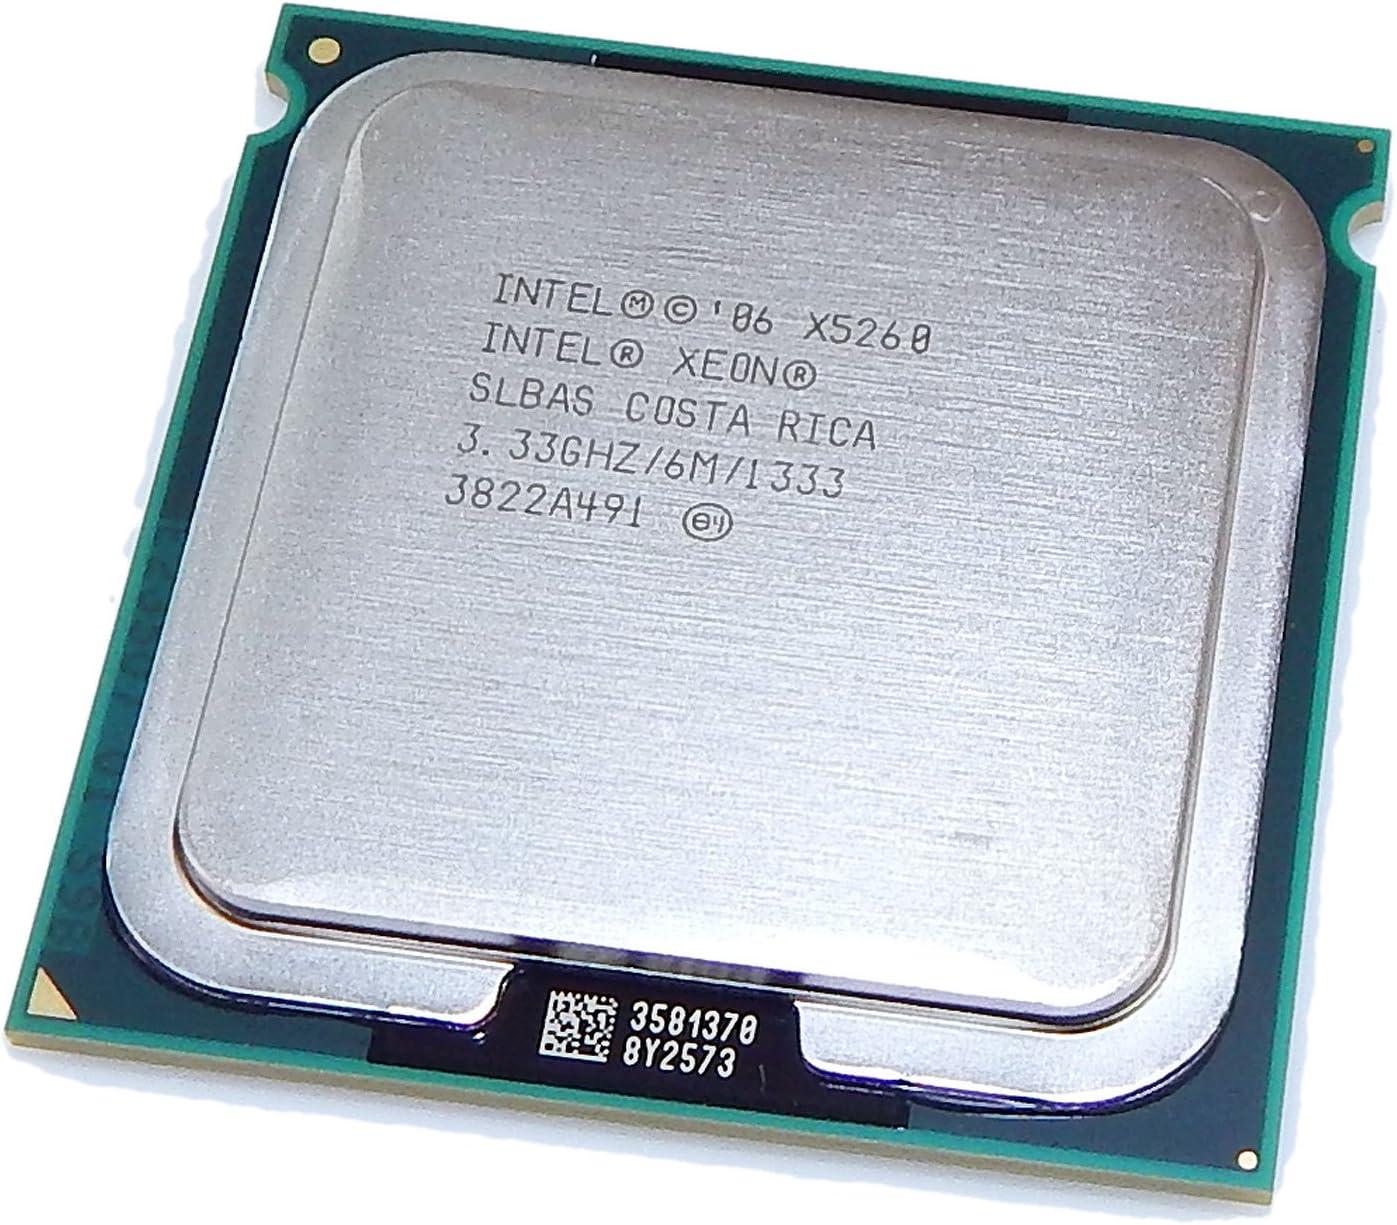 Intel Xeon X5260 333GHz 6MB LGA771 1333 CPU SLBAS